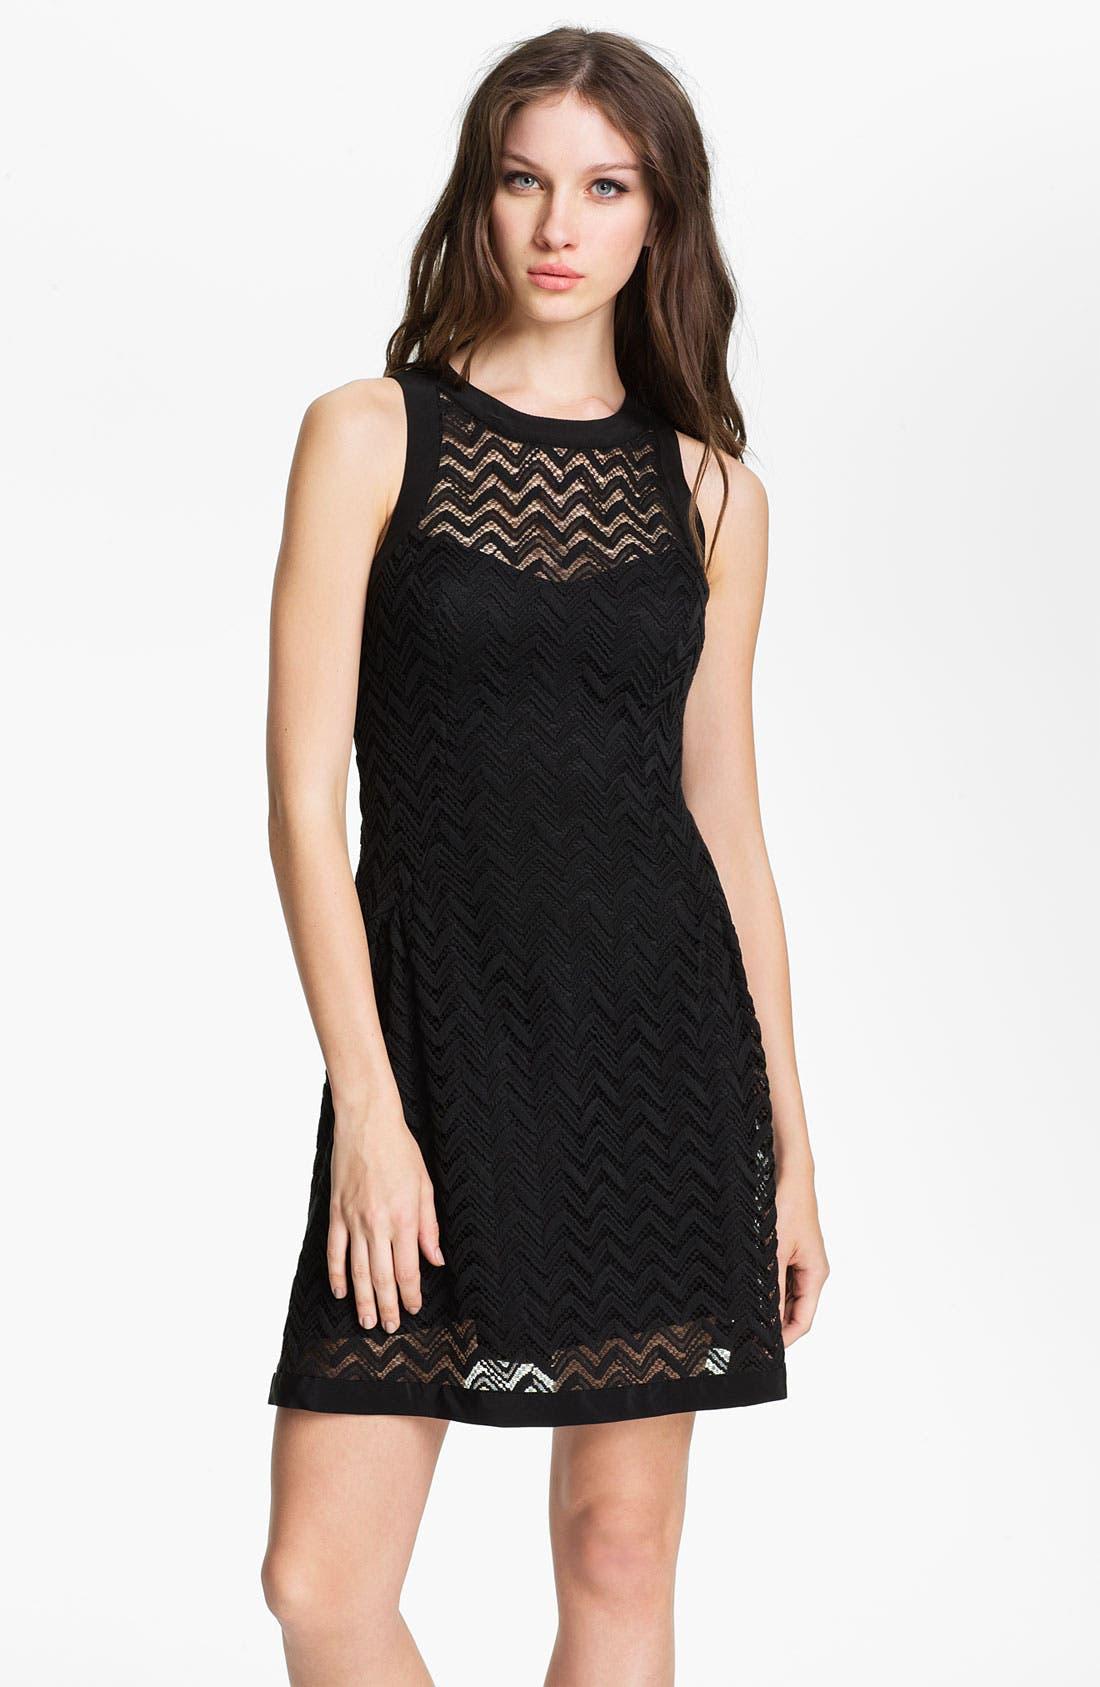 Alternate Image 1 Selected - Nanette Lepore 'Groovy' Knit Shift Dress